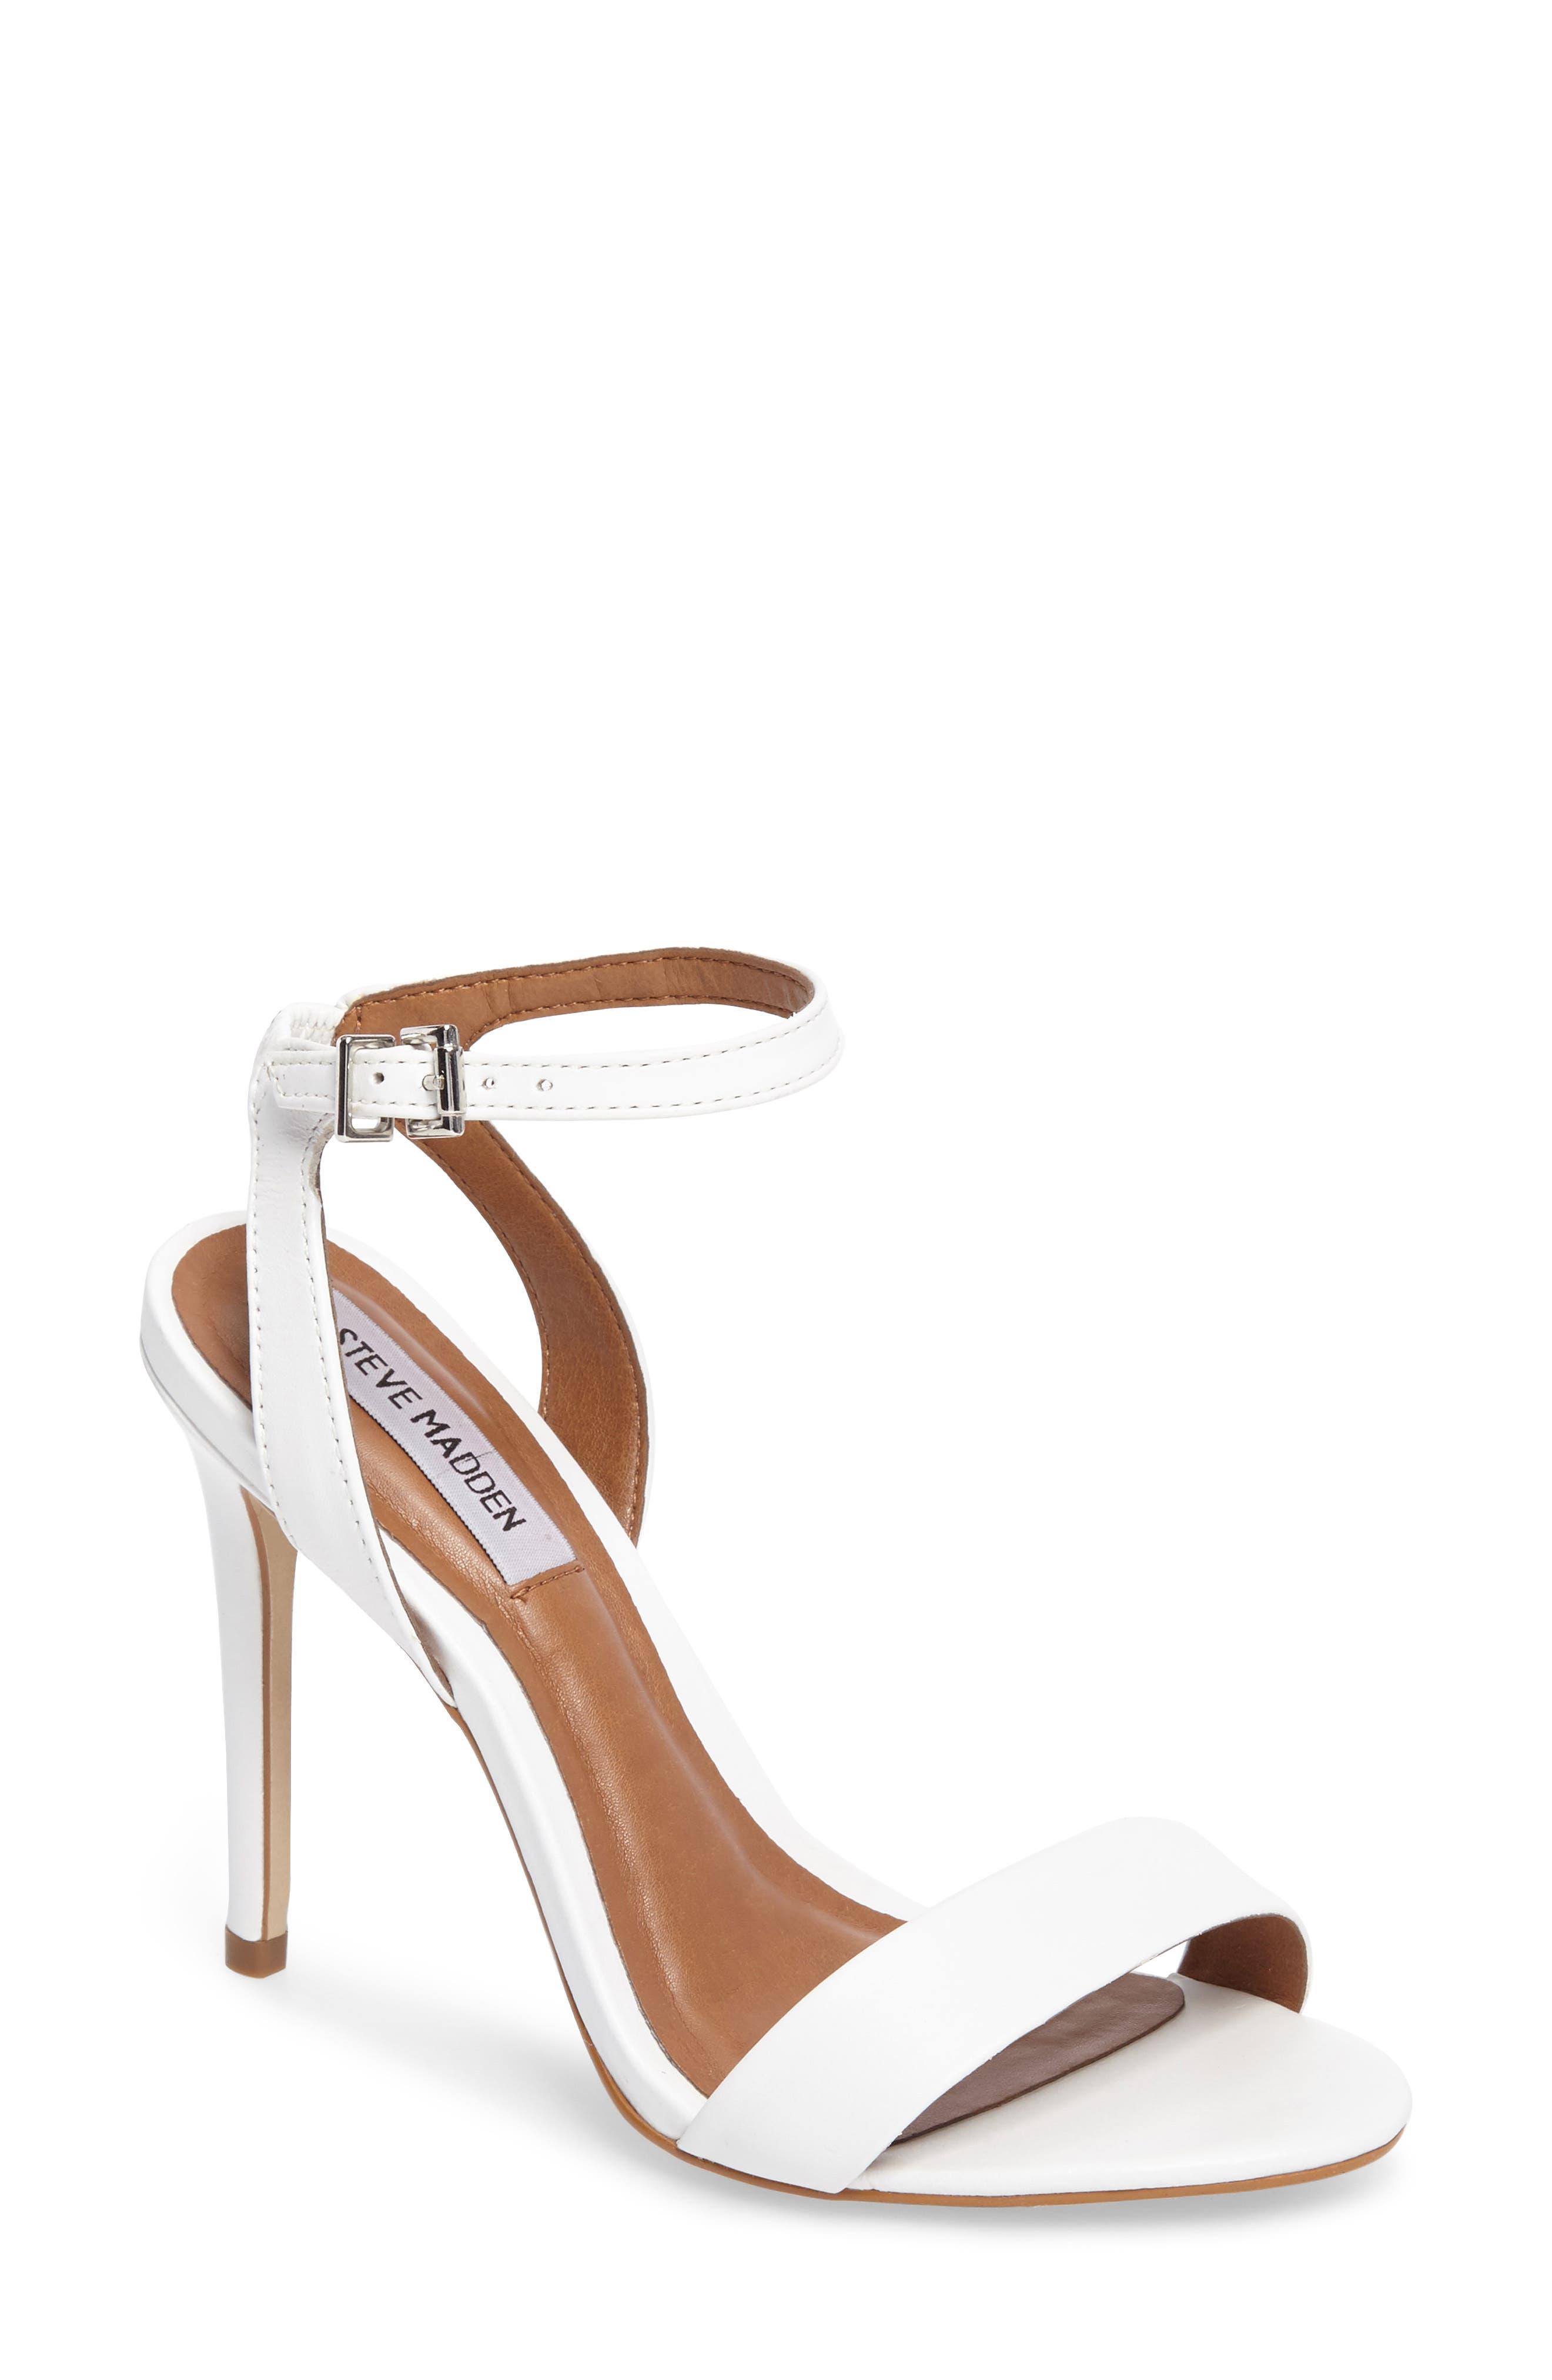 White Shoes Heels a1xgabEA